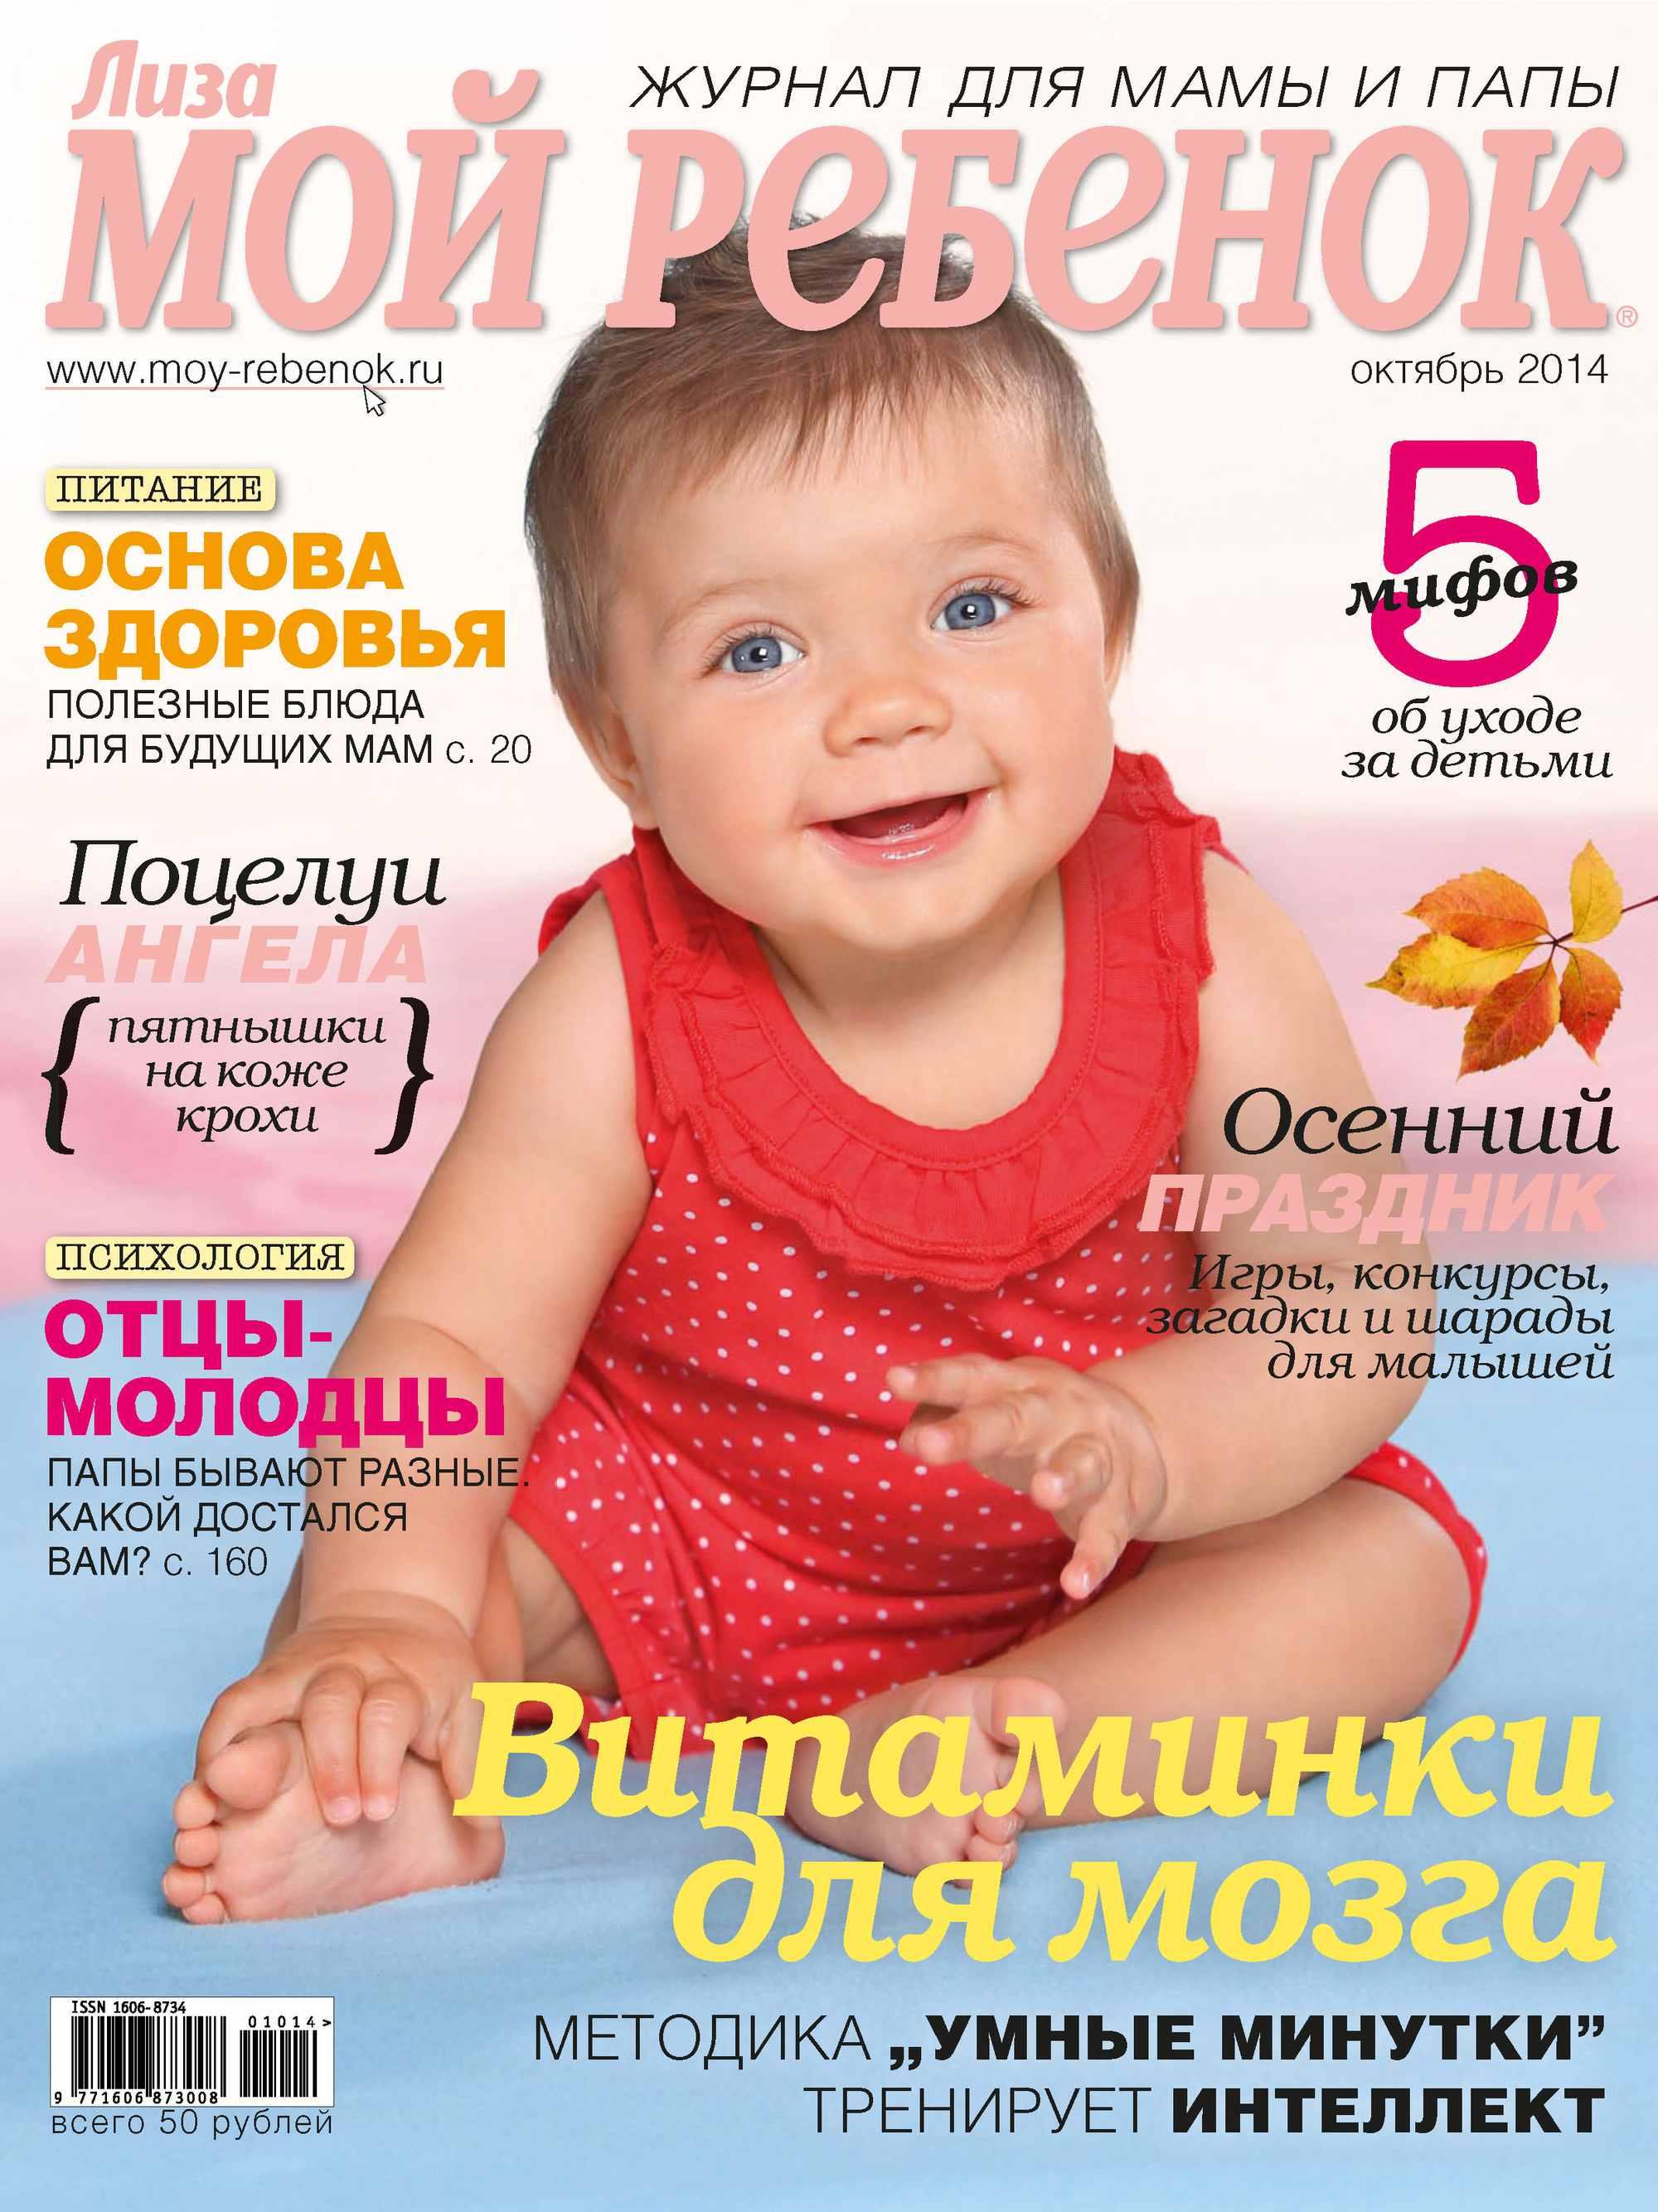 ИД «Бурда» Журнал «Лиза. Мой ребенок» №10/2014 ид бурда журнал лиза мой ребенок 03 2014